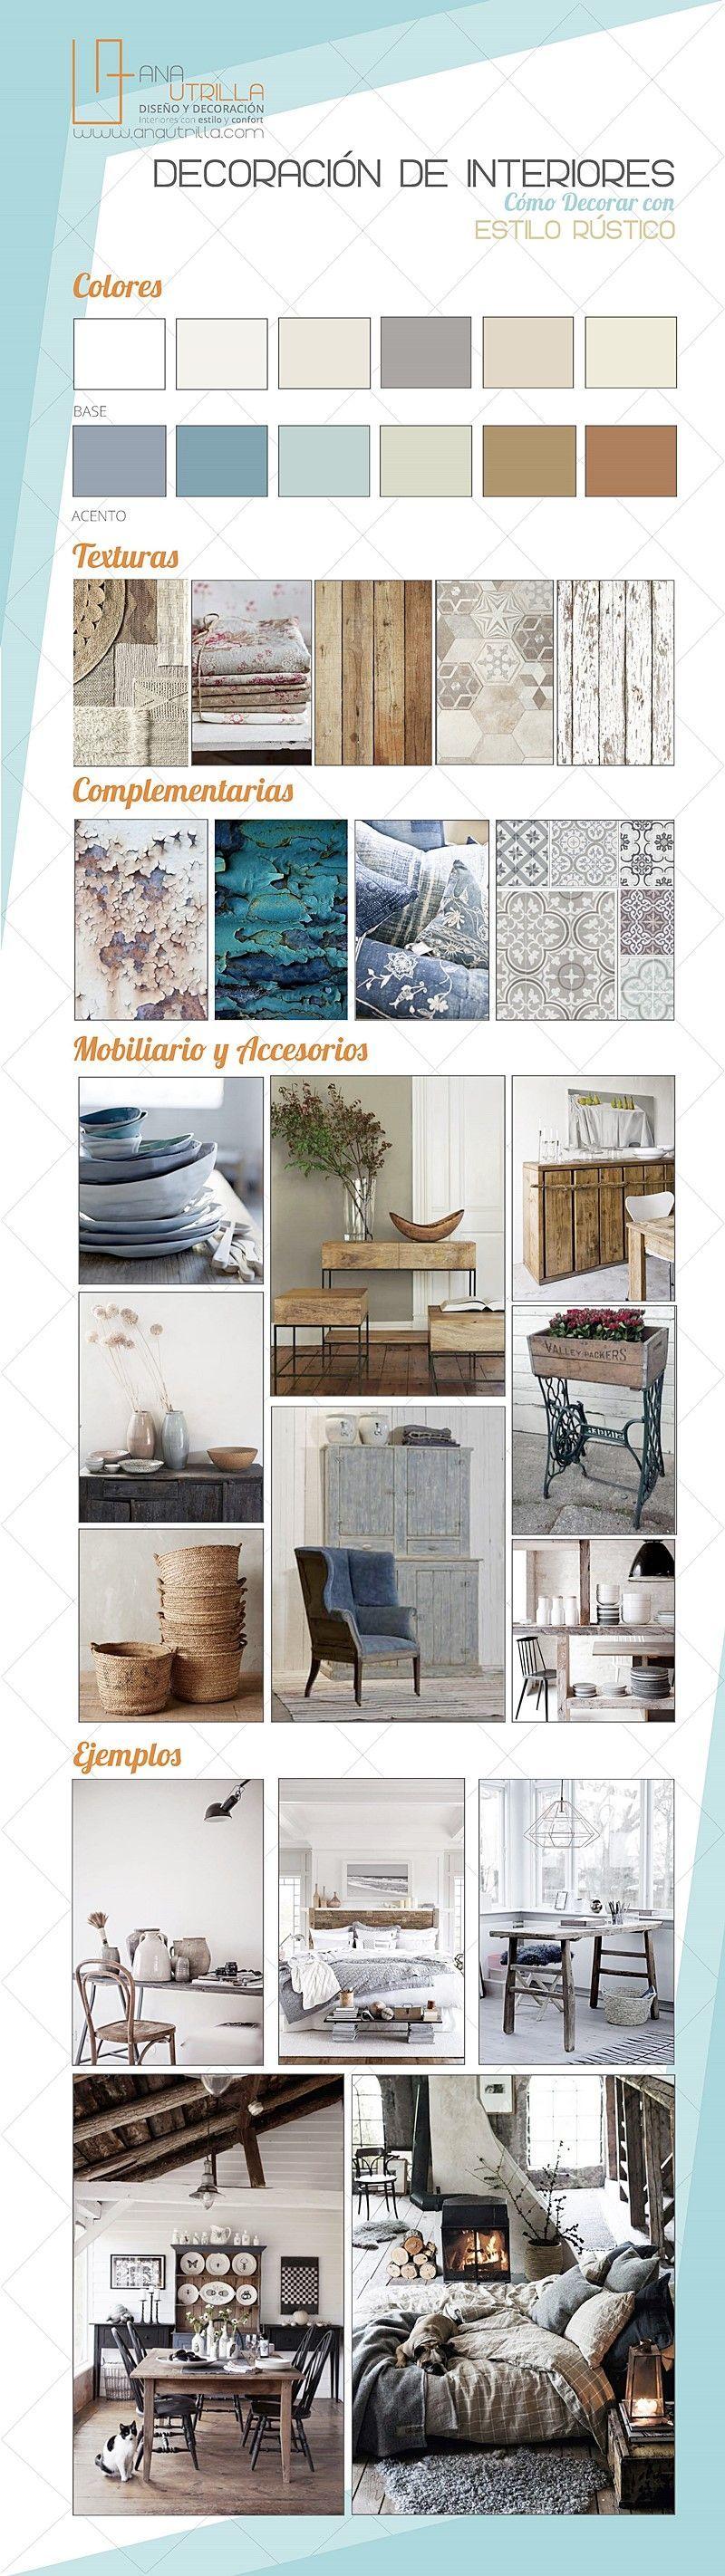 Como decorar con estilo rústico tu espacio, consejos e ideas para tu casa por Ana Utrilla